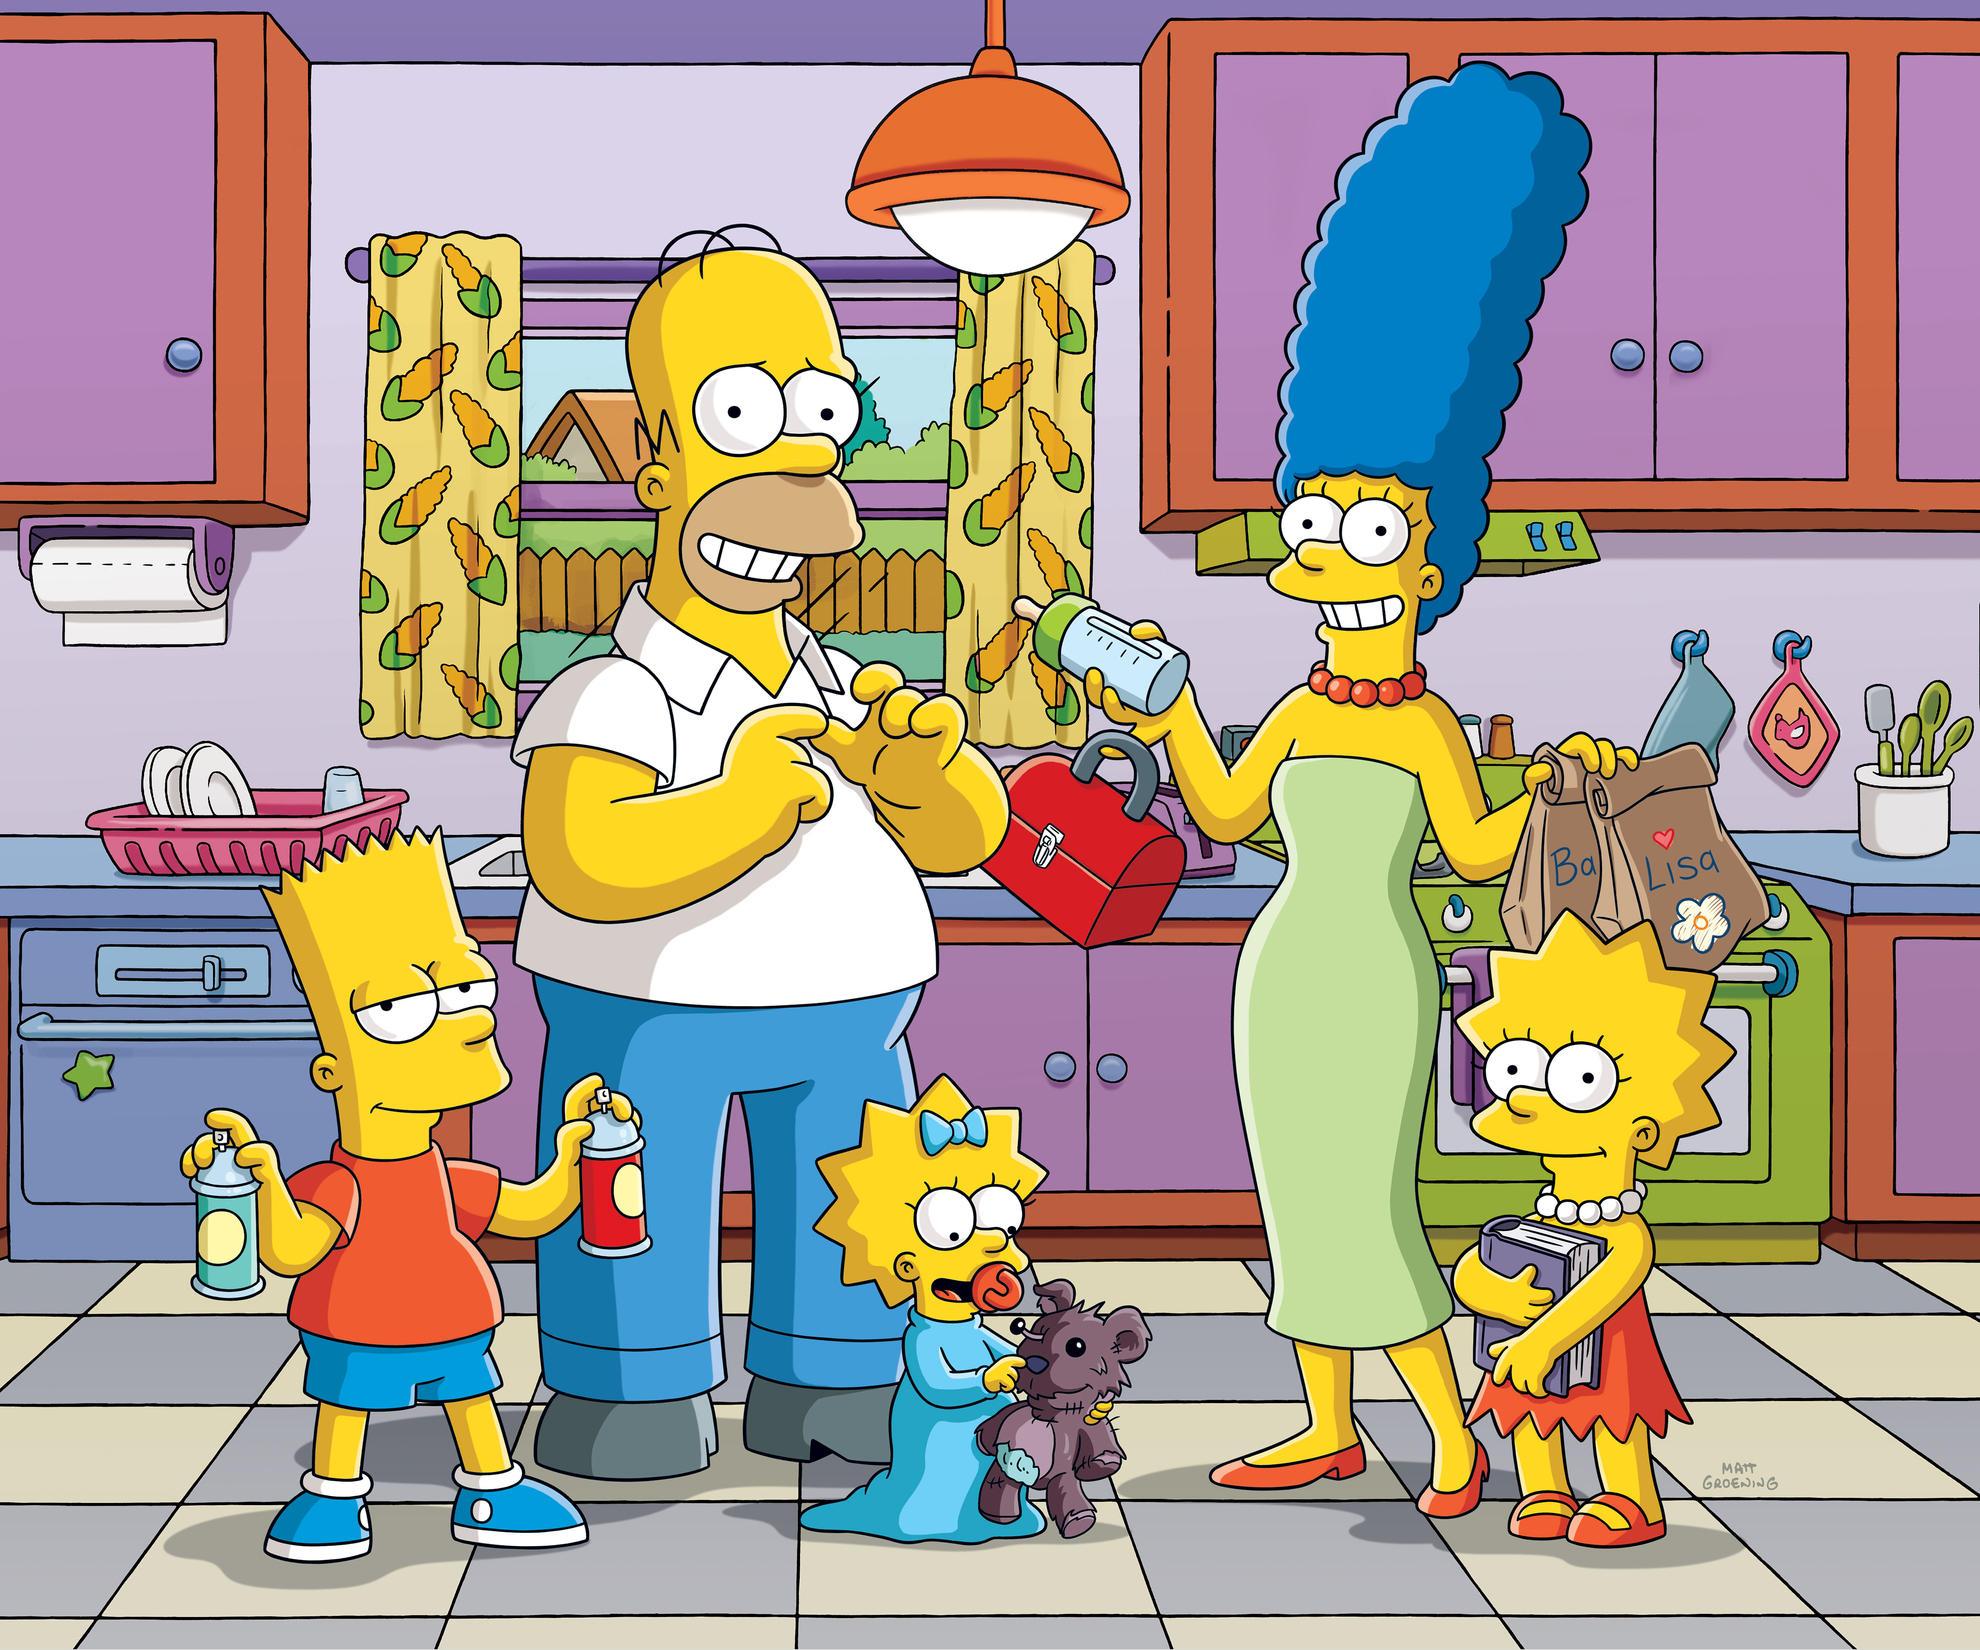 Simpsons 'Homer at the Bat' mockumentary debuting on Sunday